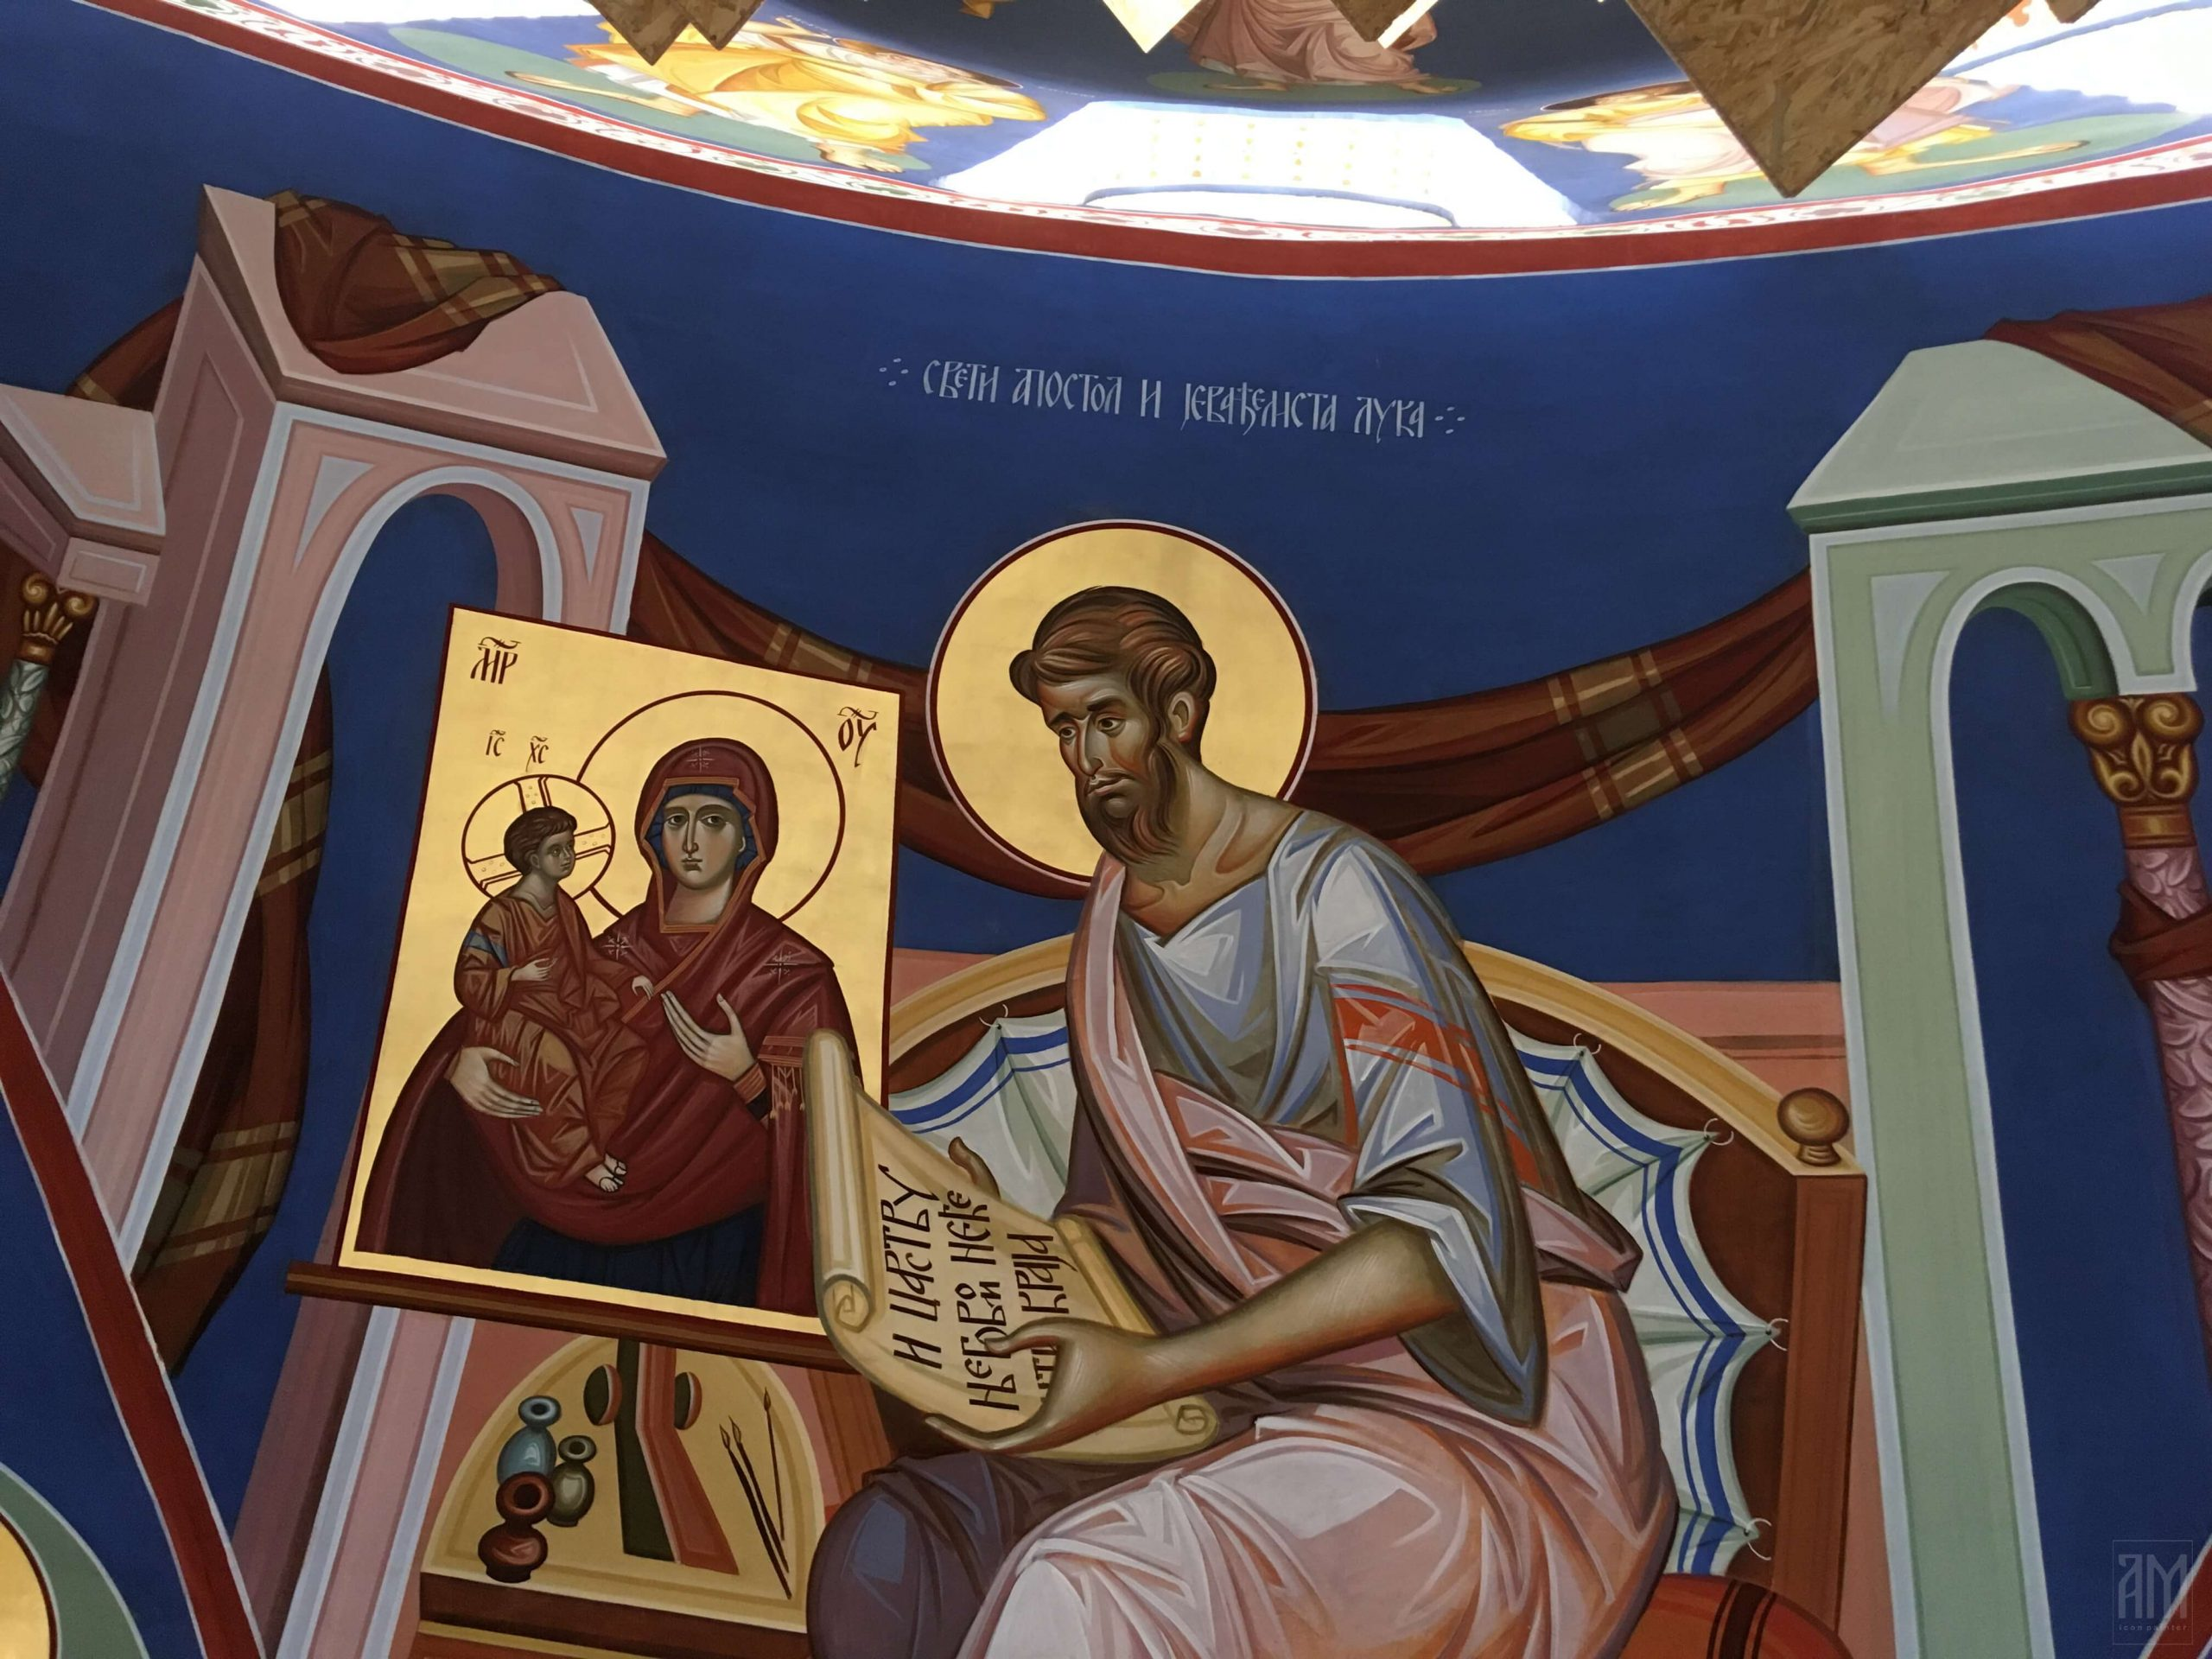 Ana Maljevic - Ikone sa blagoslovom Crkve - Radovi - Freske 09